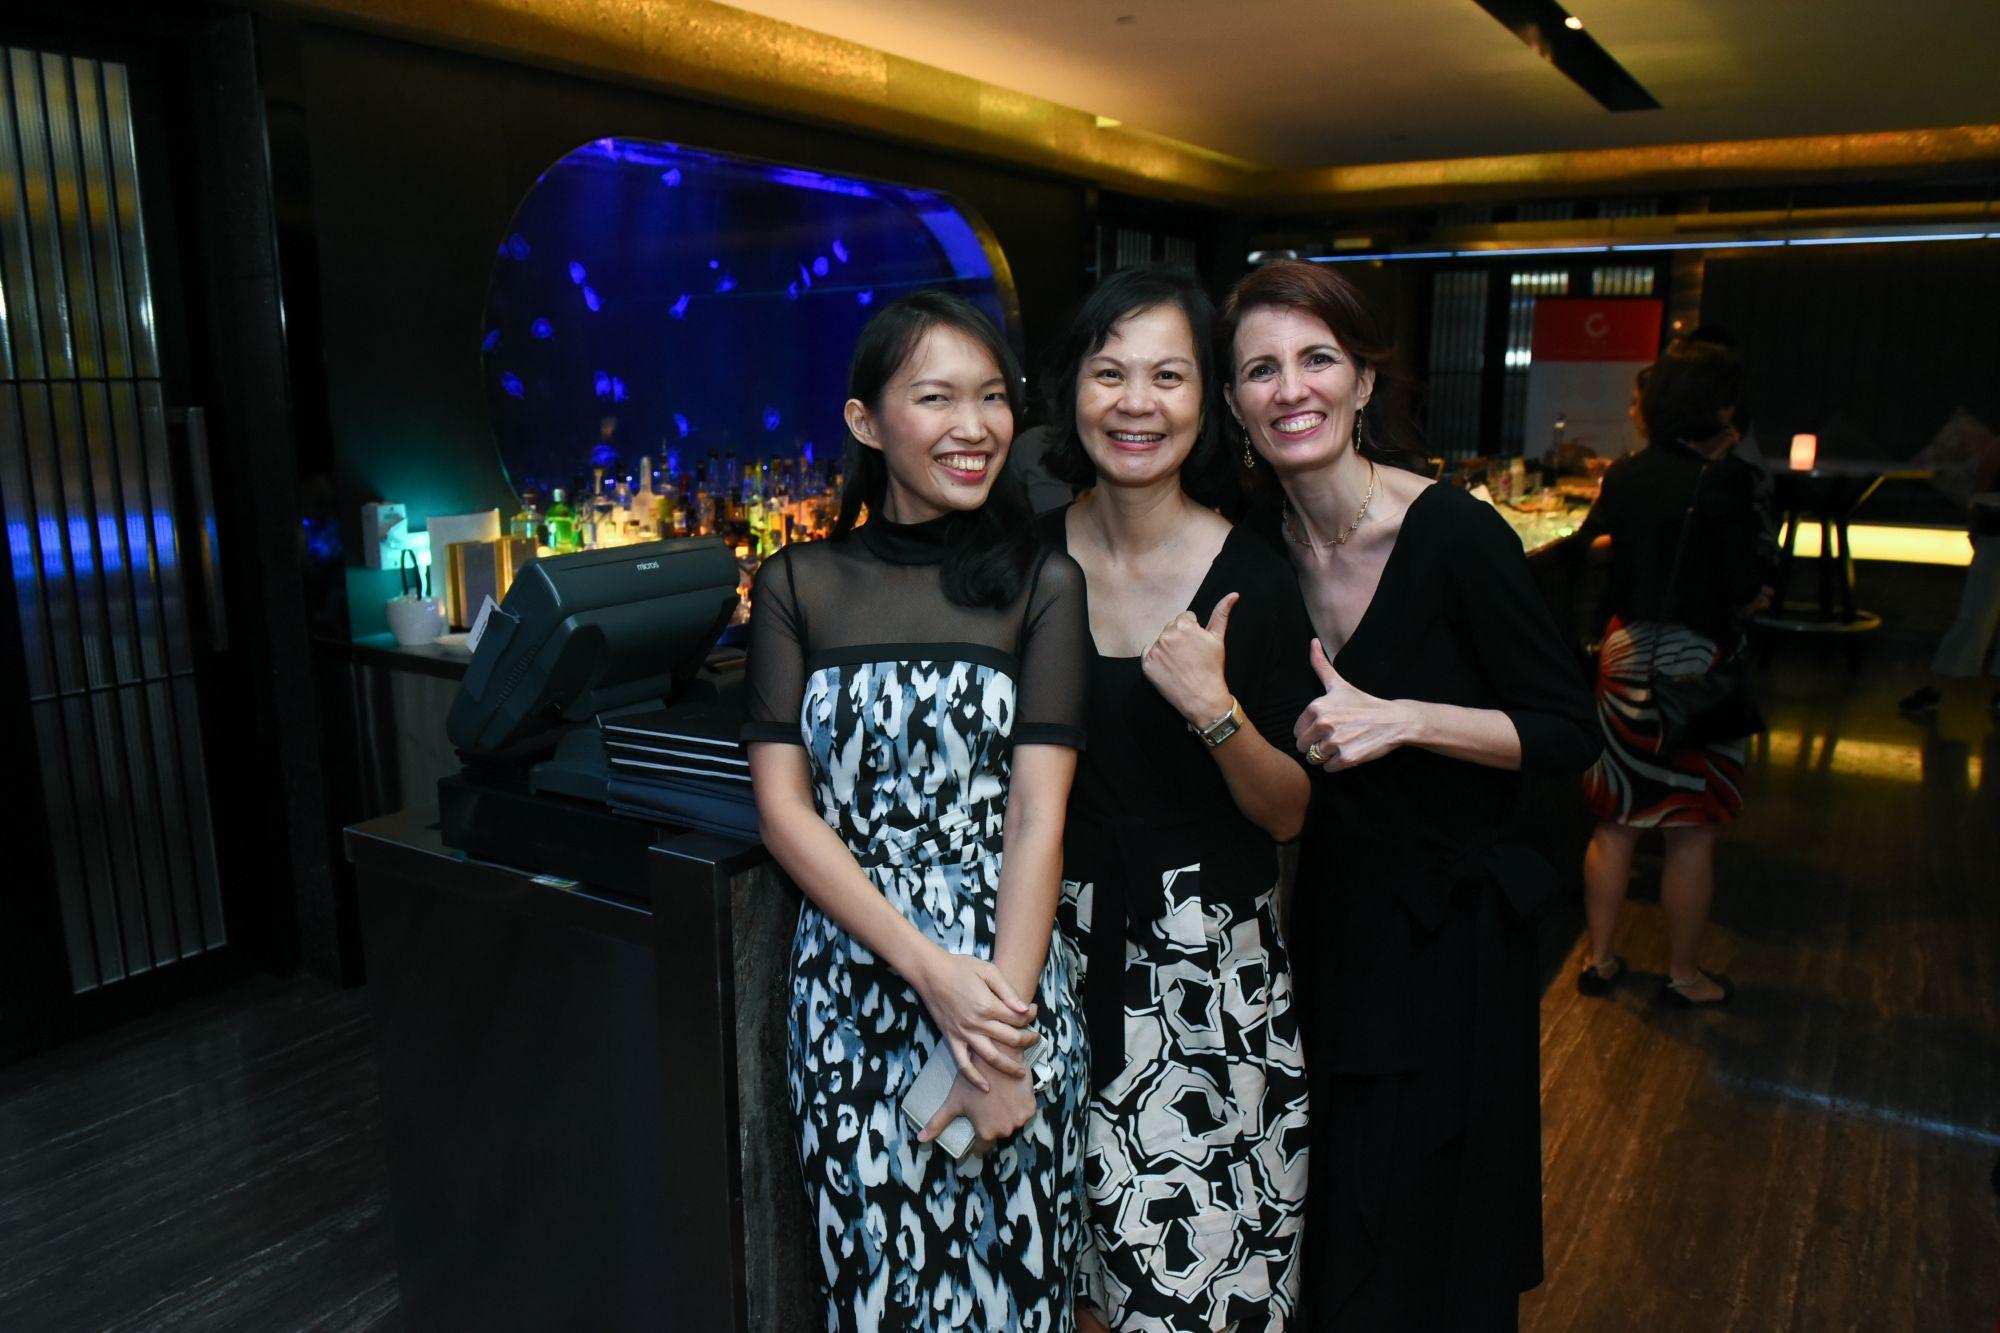 Cheryl Chung, Yee Foong, Anne Marie Clavelli